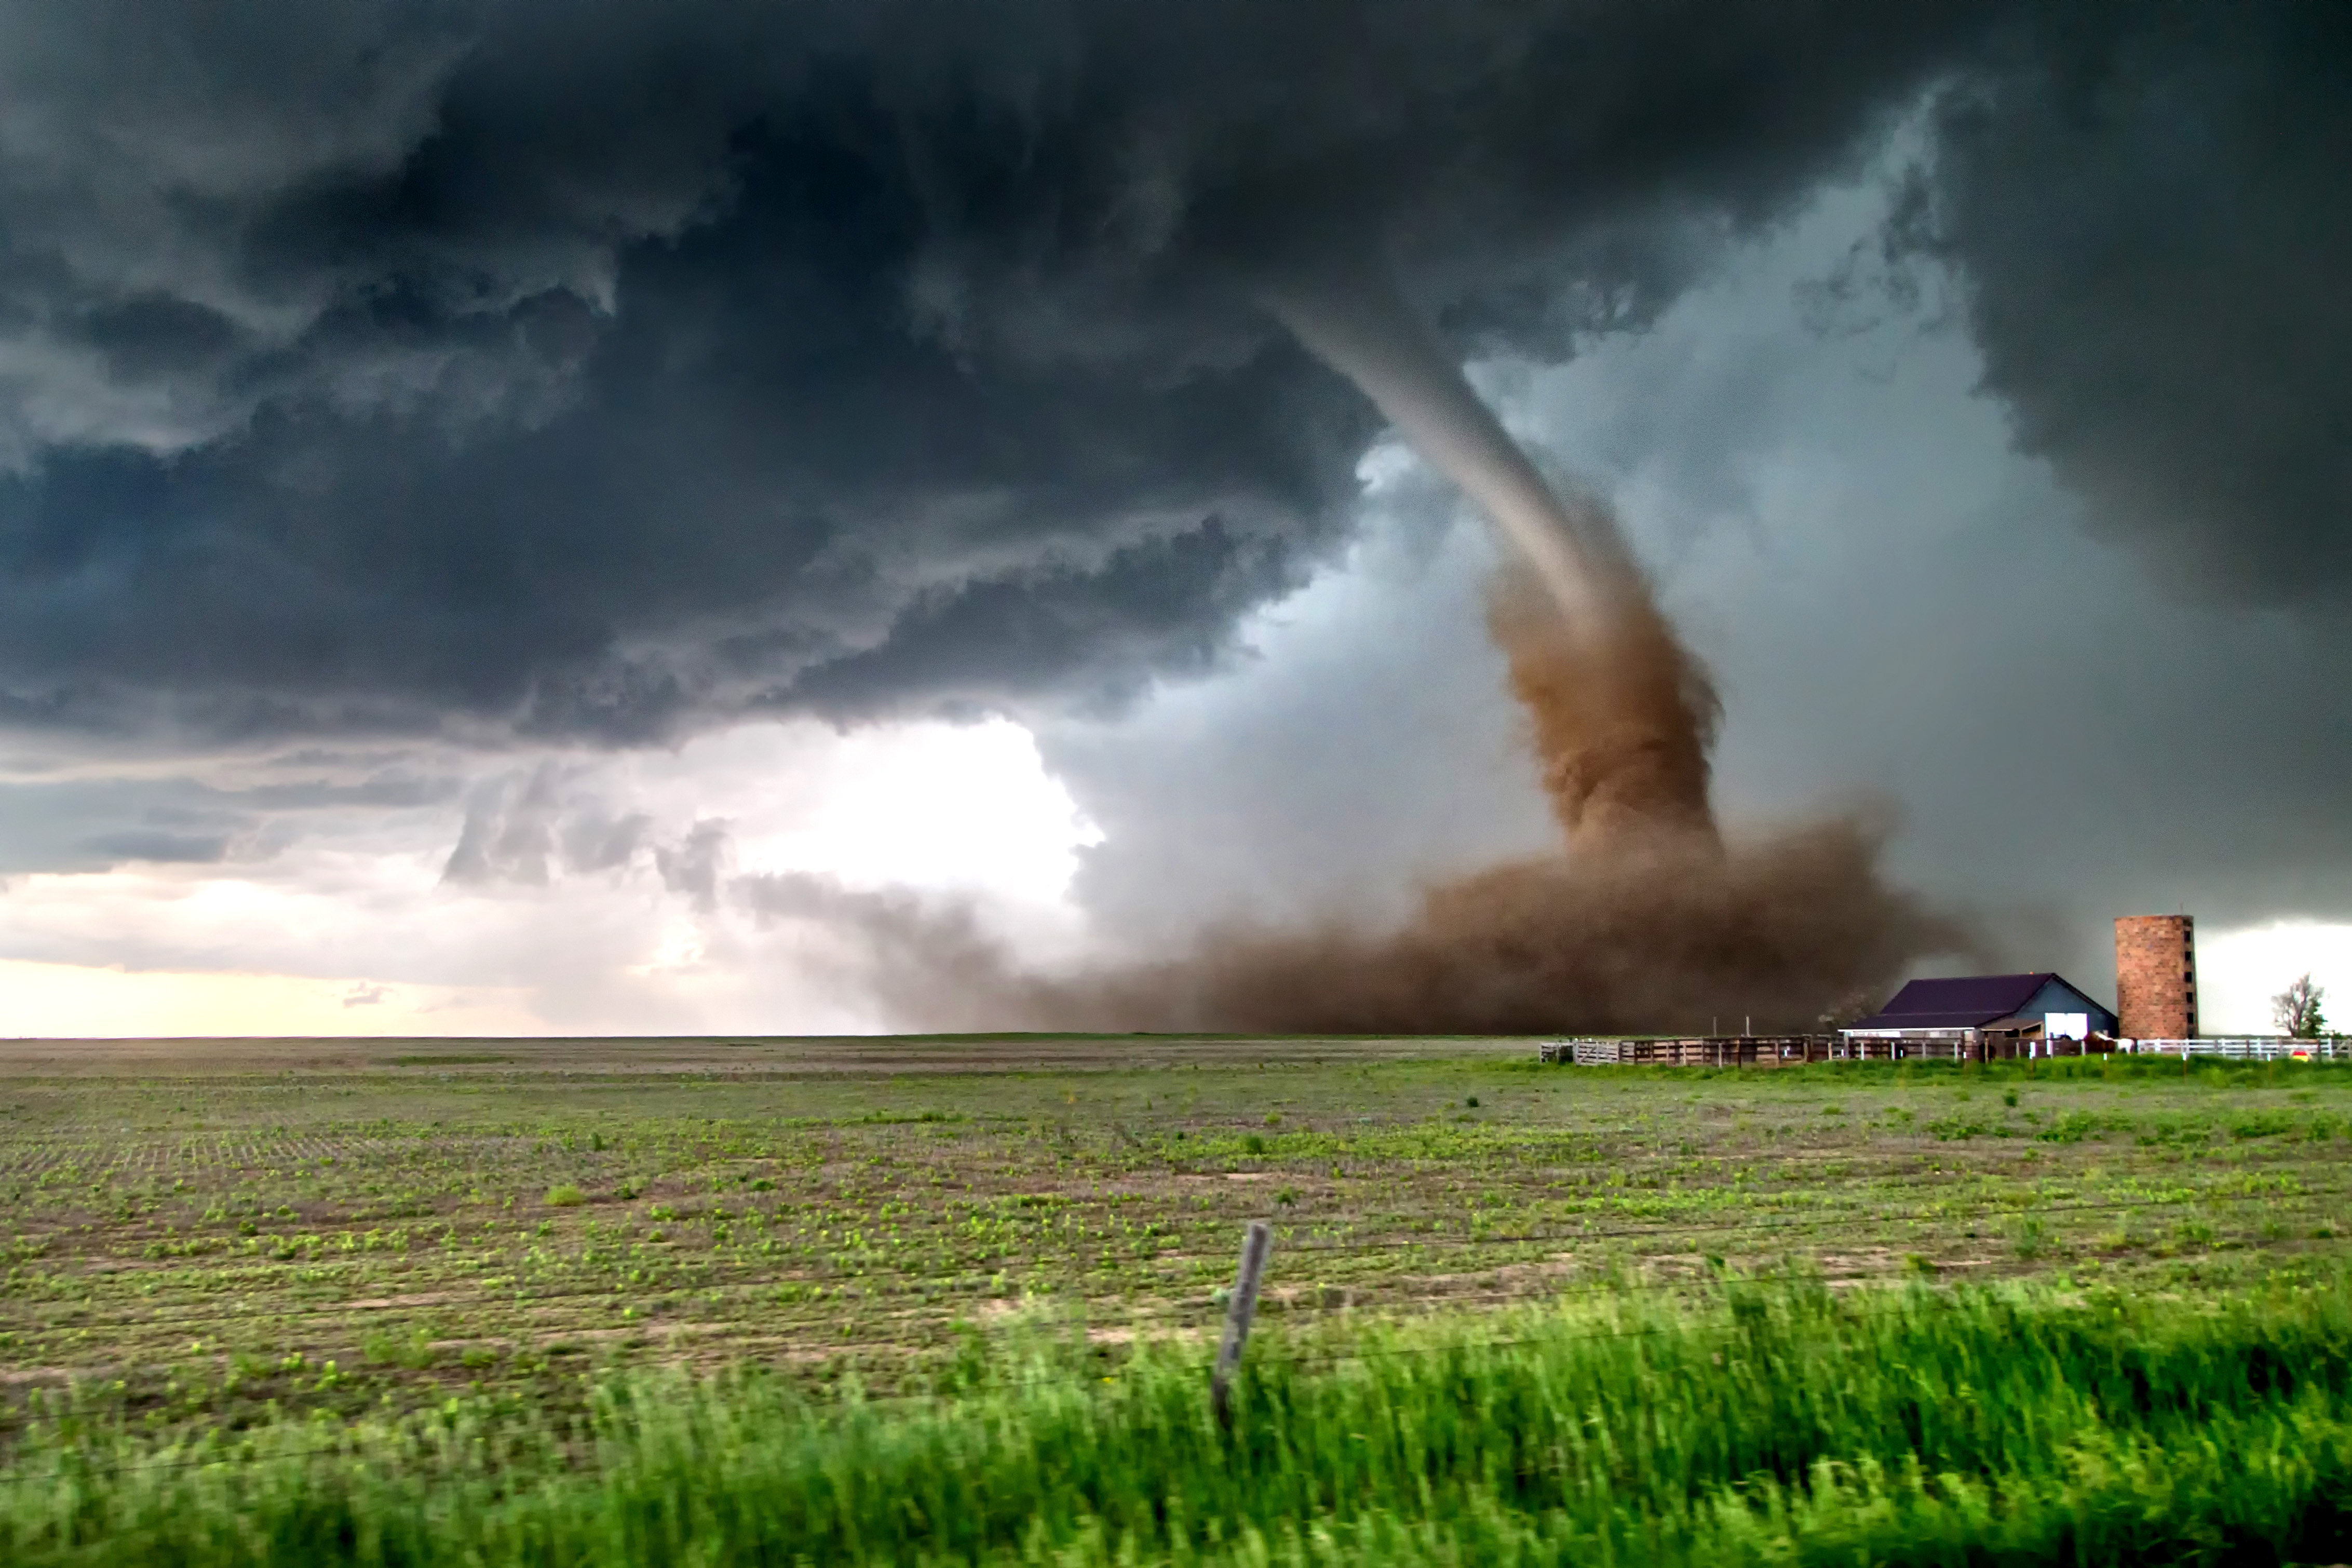 Home Nature Tornado Desktop Wallpaper   Desktop Backgrounds 4530x3020